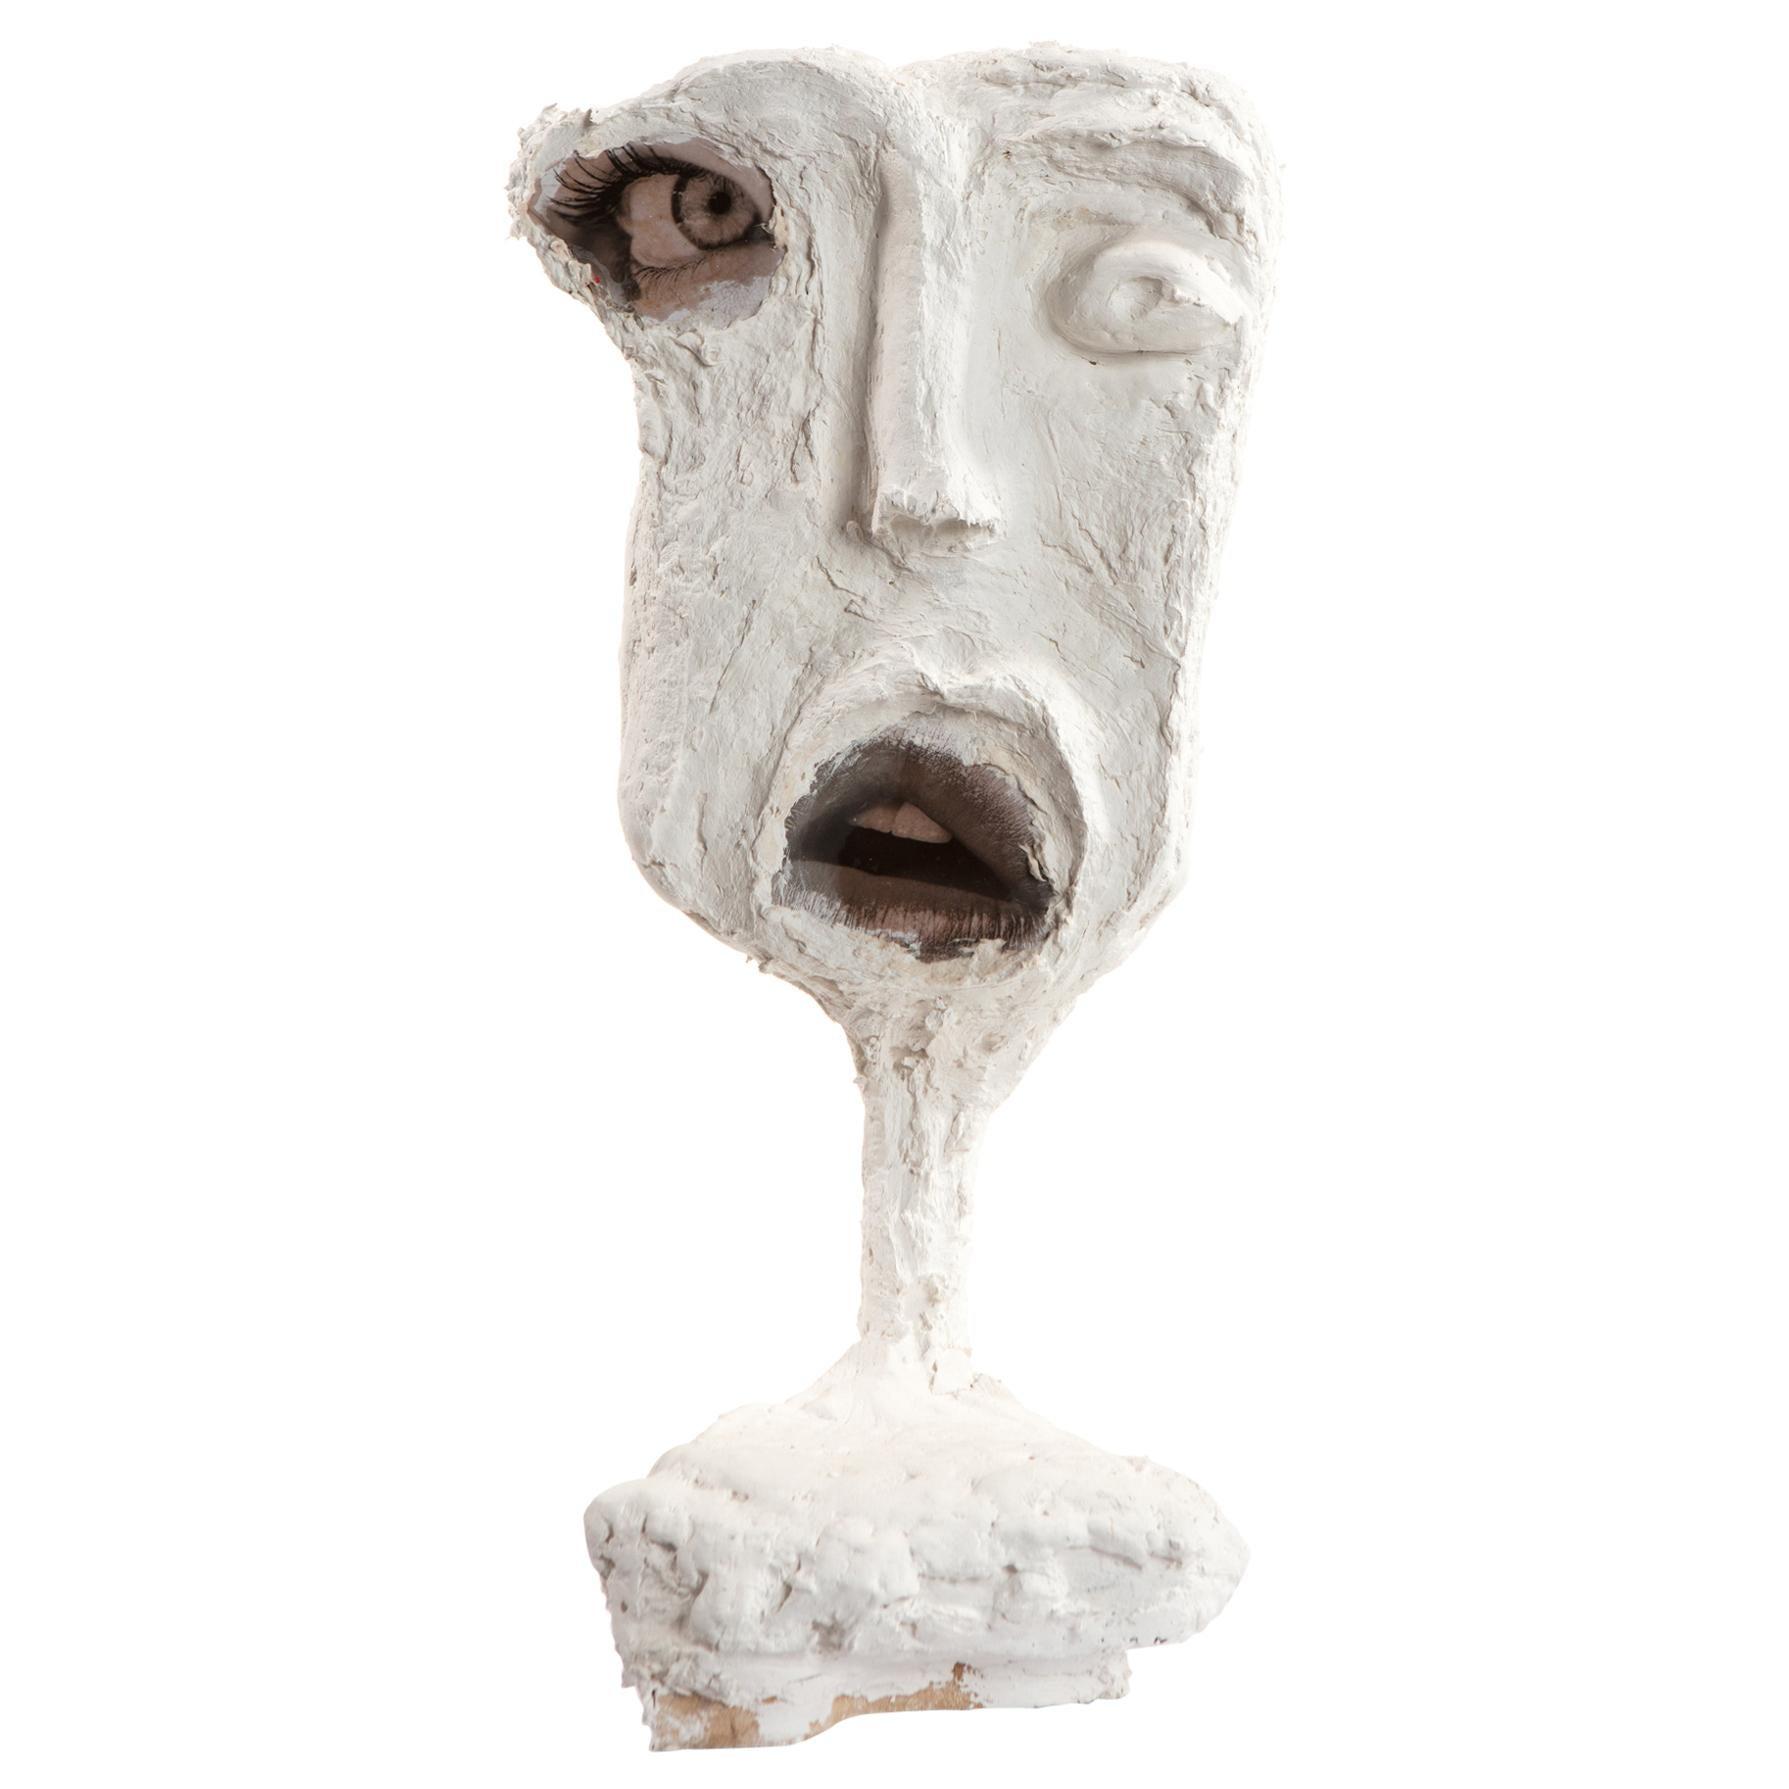 White Plaster Sculptural Figure Face, 21st Century by Mattia Biagi